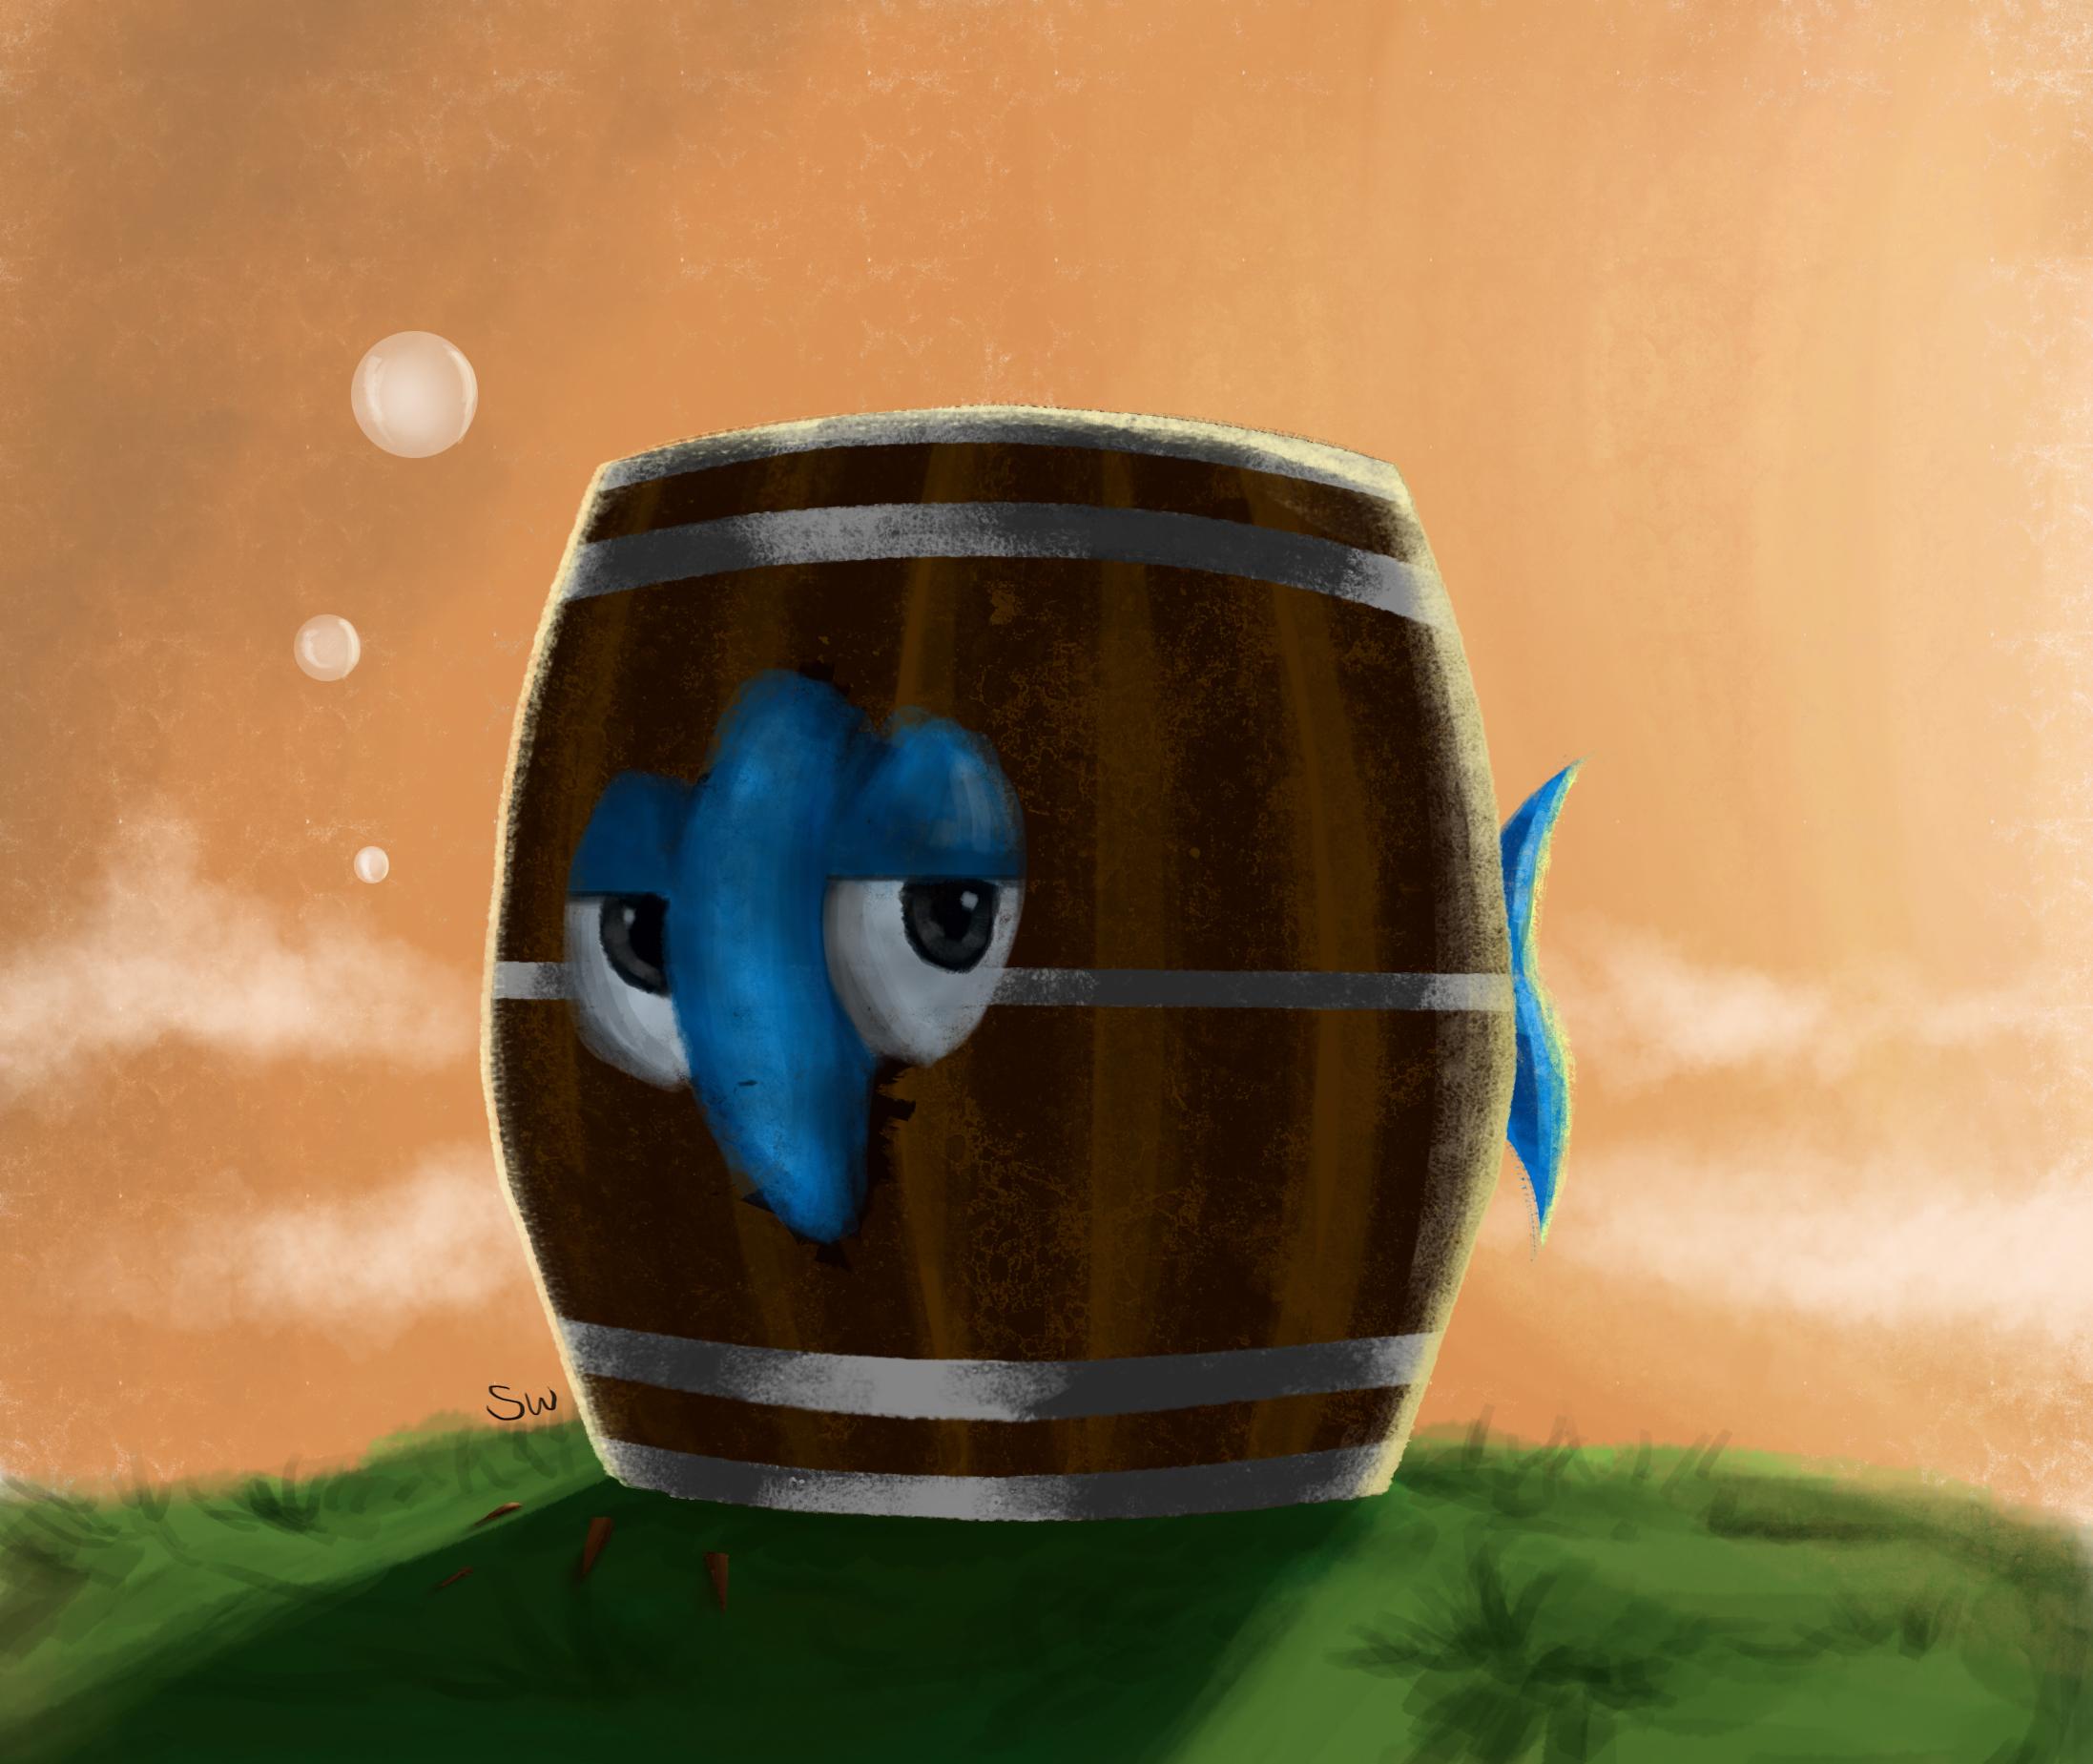 FishInABarrel